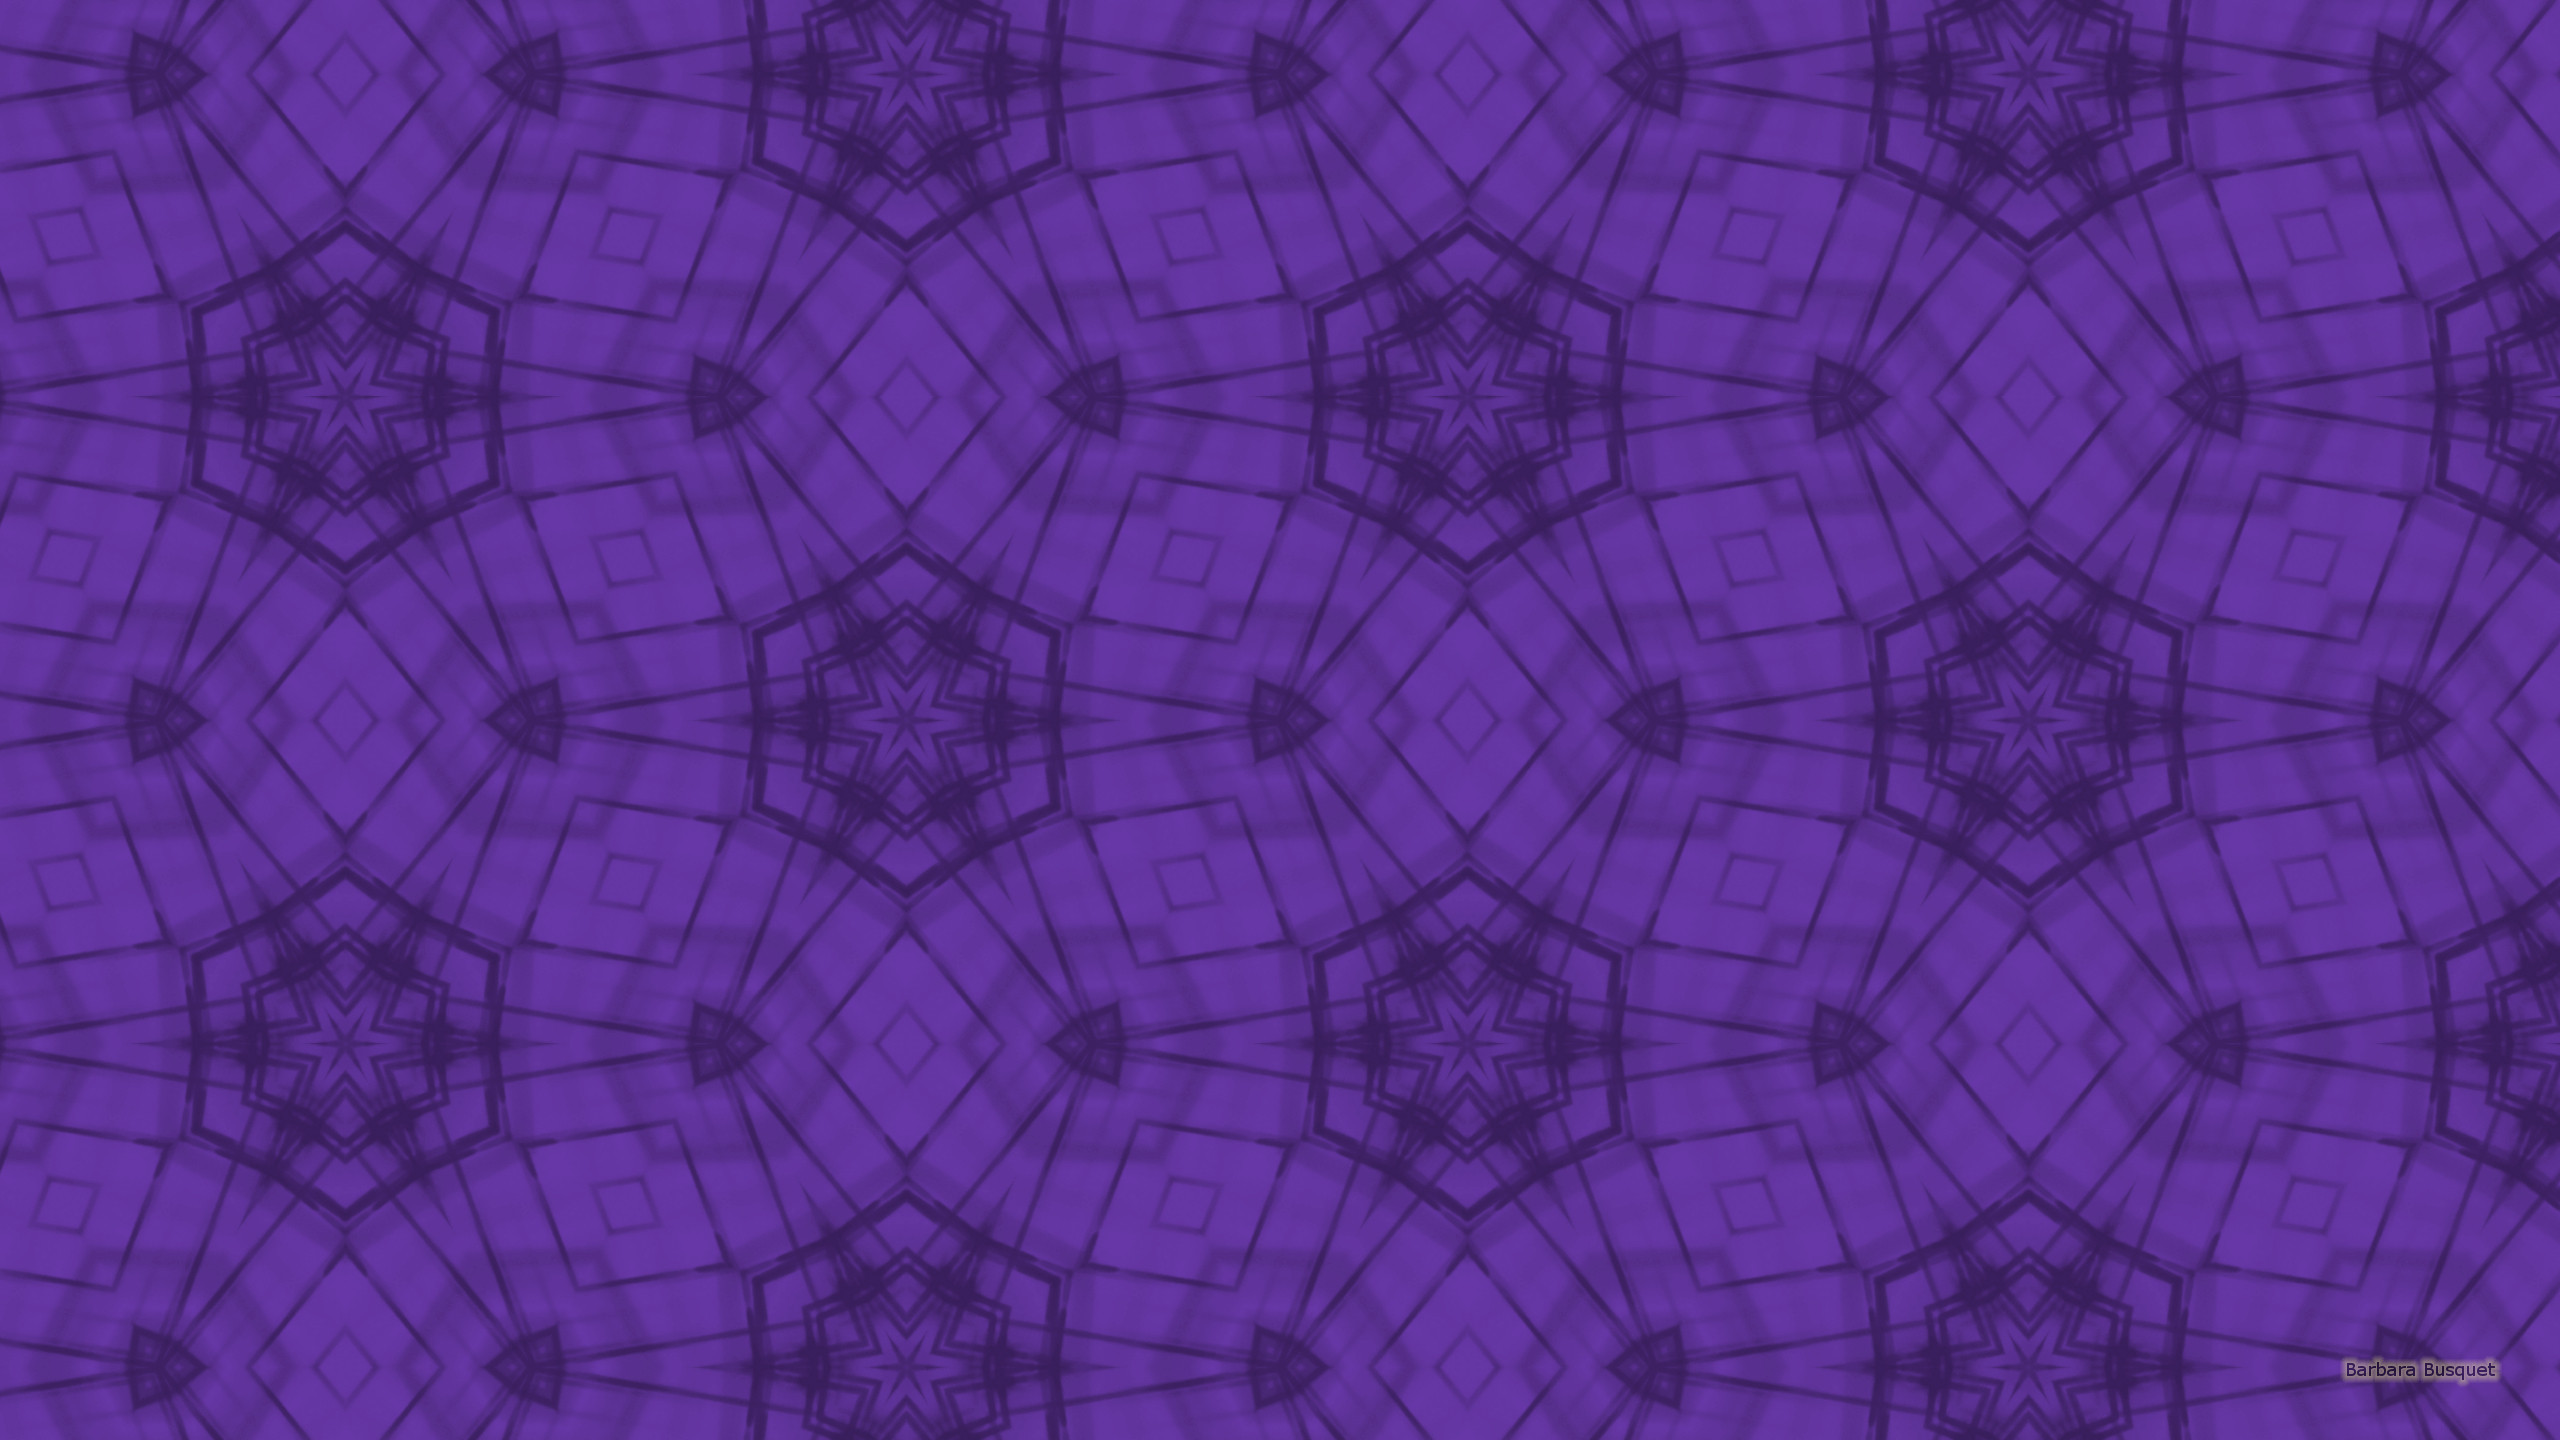 Res: 2560x1440, Light and dark purple star pattern wallpaper